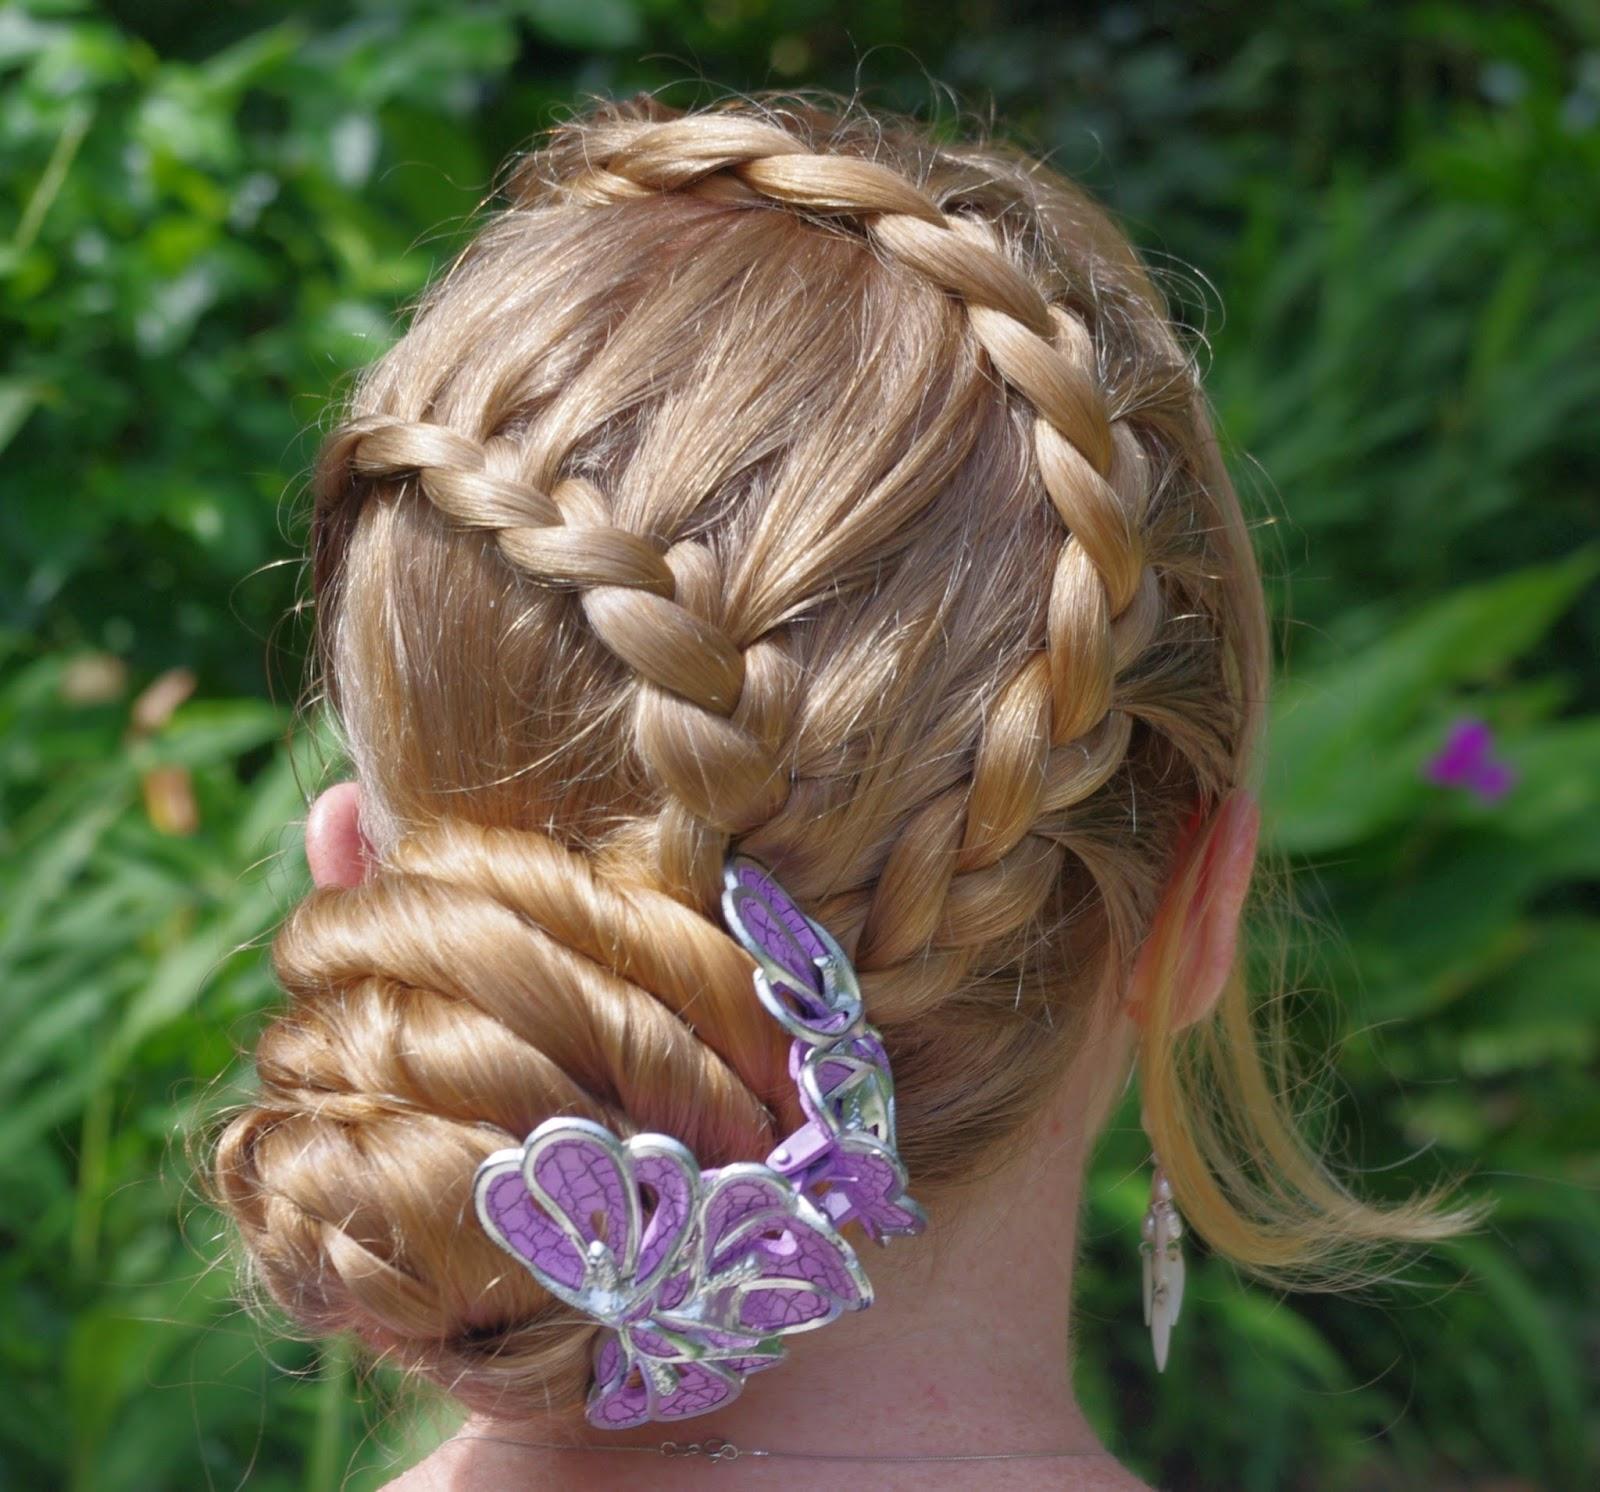 Braids & Hairstyles For Super Long Hair: Purple Hairclip